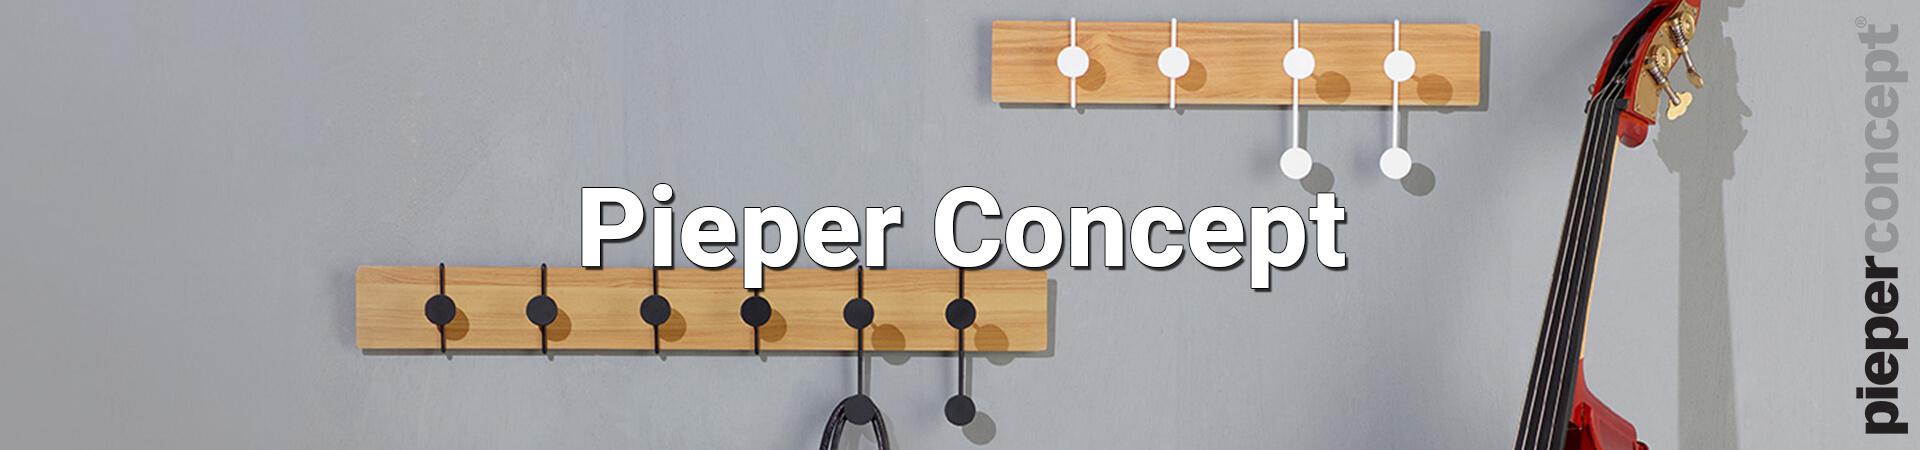 Pieper Concept